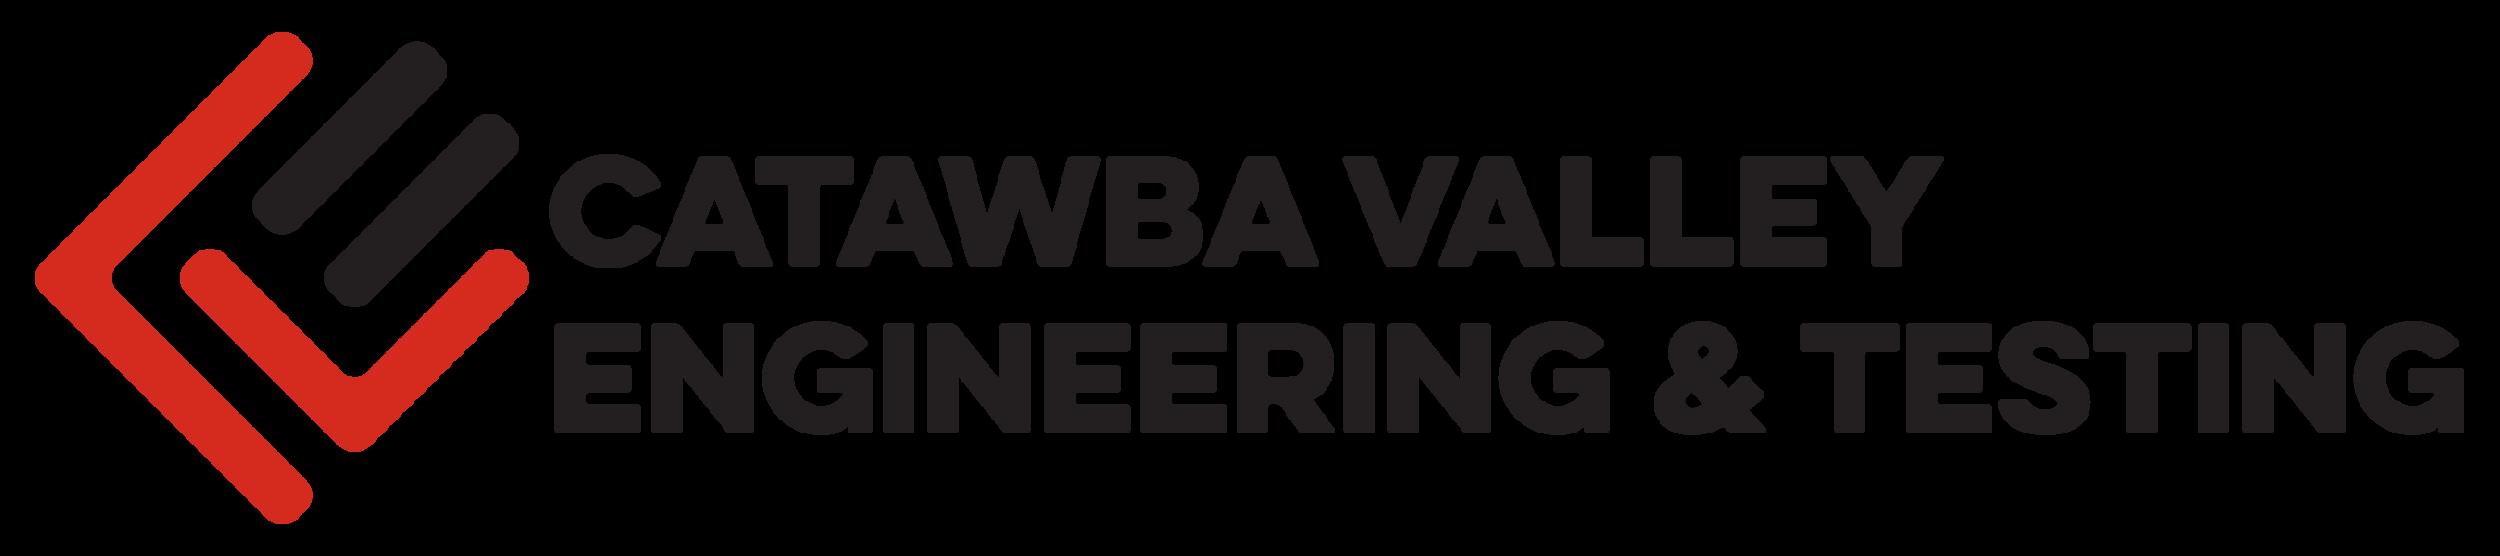 Catawba Valley Engineering & Testing